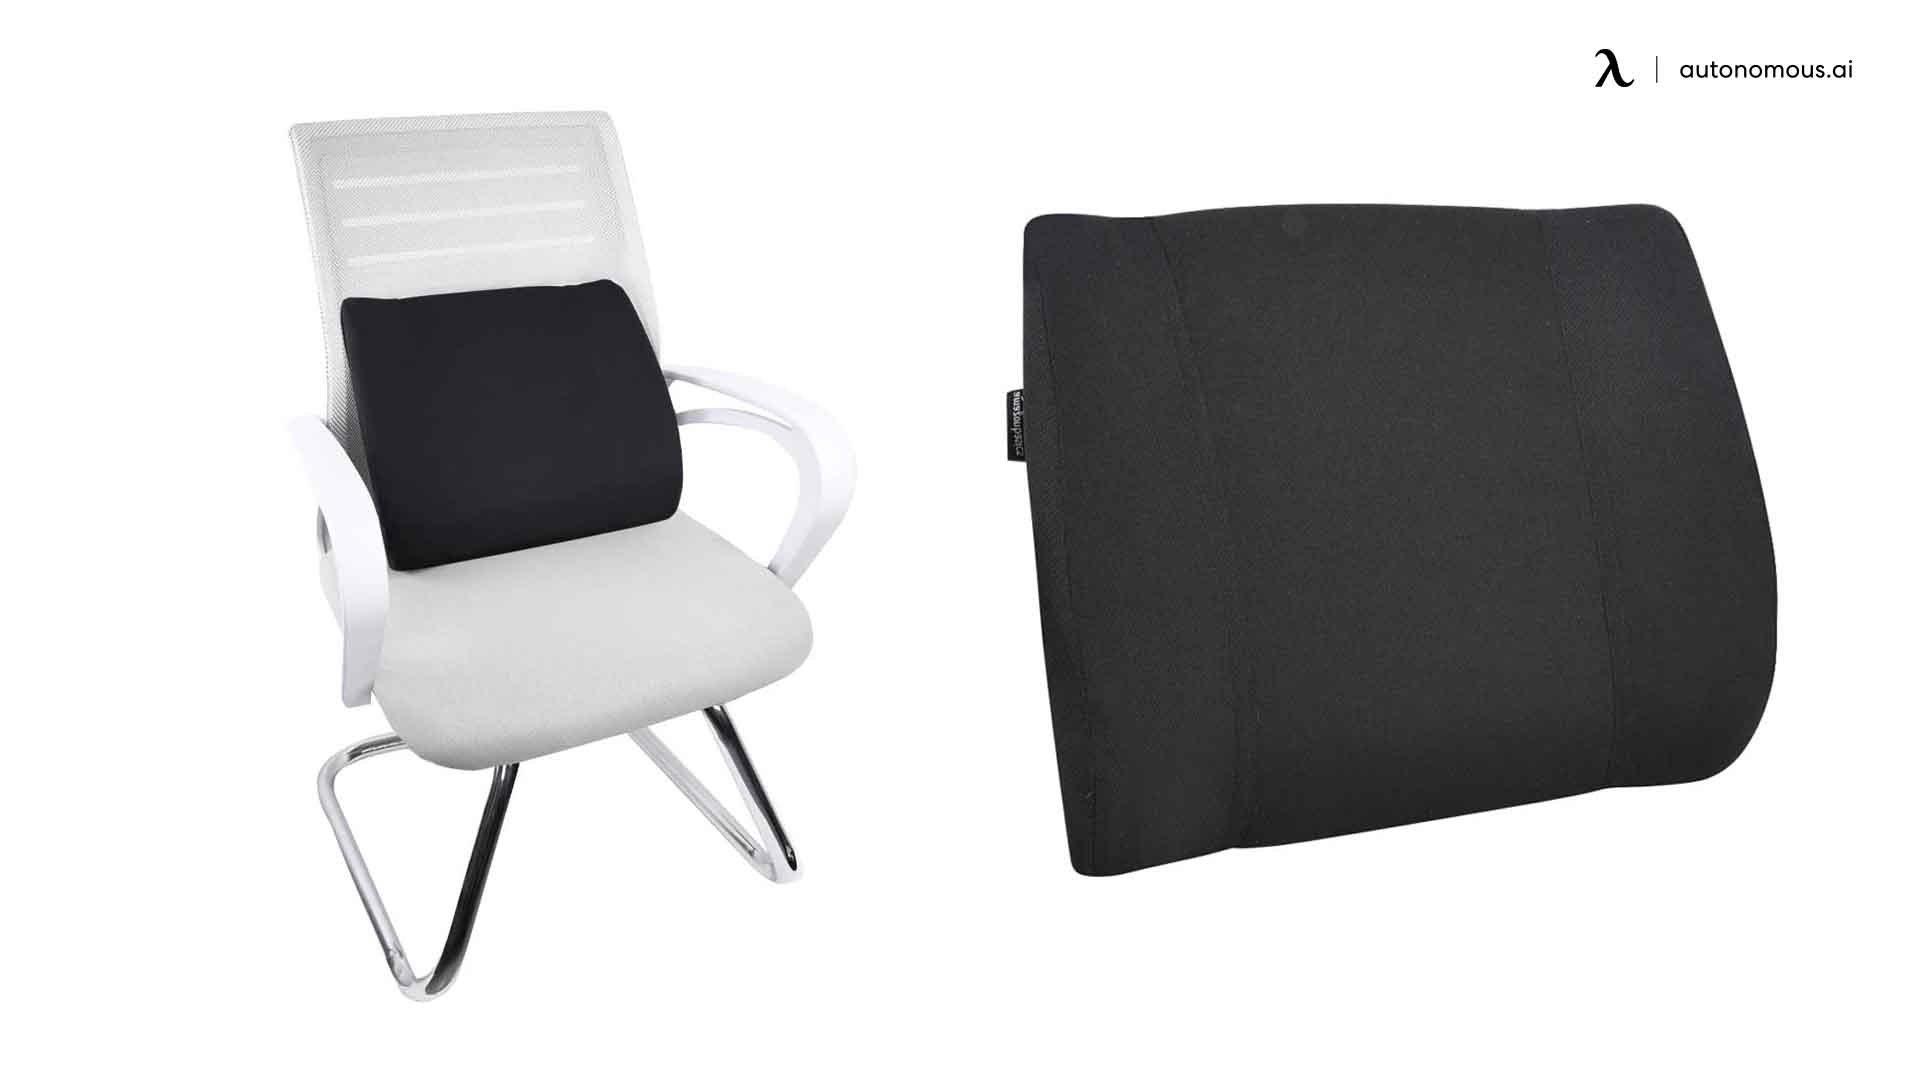 AmazonBasics Memory Foam Lumbar Back Support Pillow